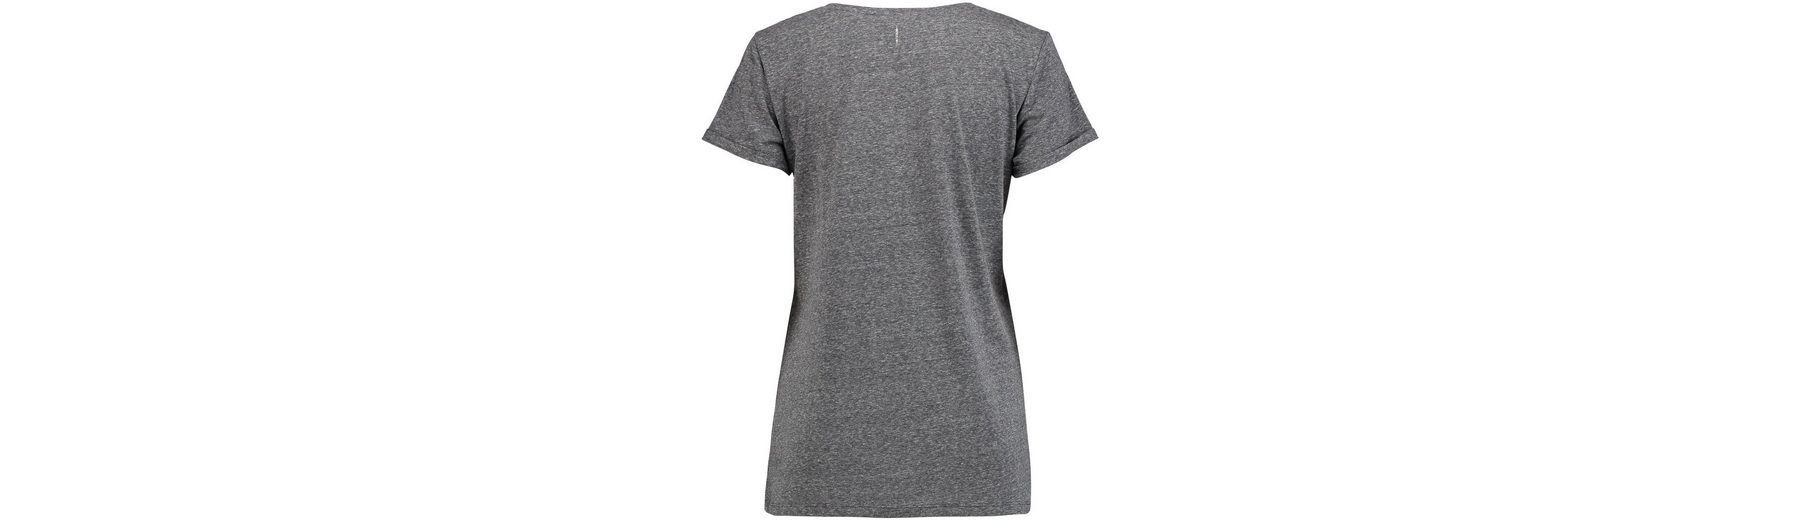 O'Neill T-Shirt kurzärmlig Freedom Outlet Factory Outlet Aus Deutschland Freies Verschiffen Des Niedrigen Preises Outlet-Store Zum Verkauf Visa-Zahlung Günstig Online 46IIedtCJ